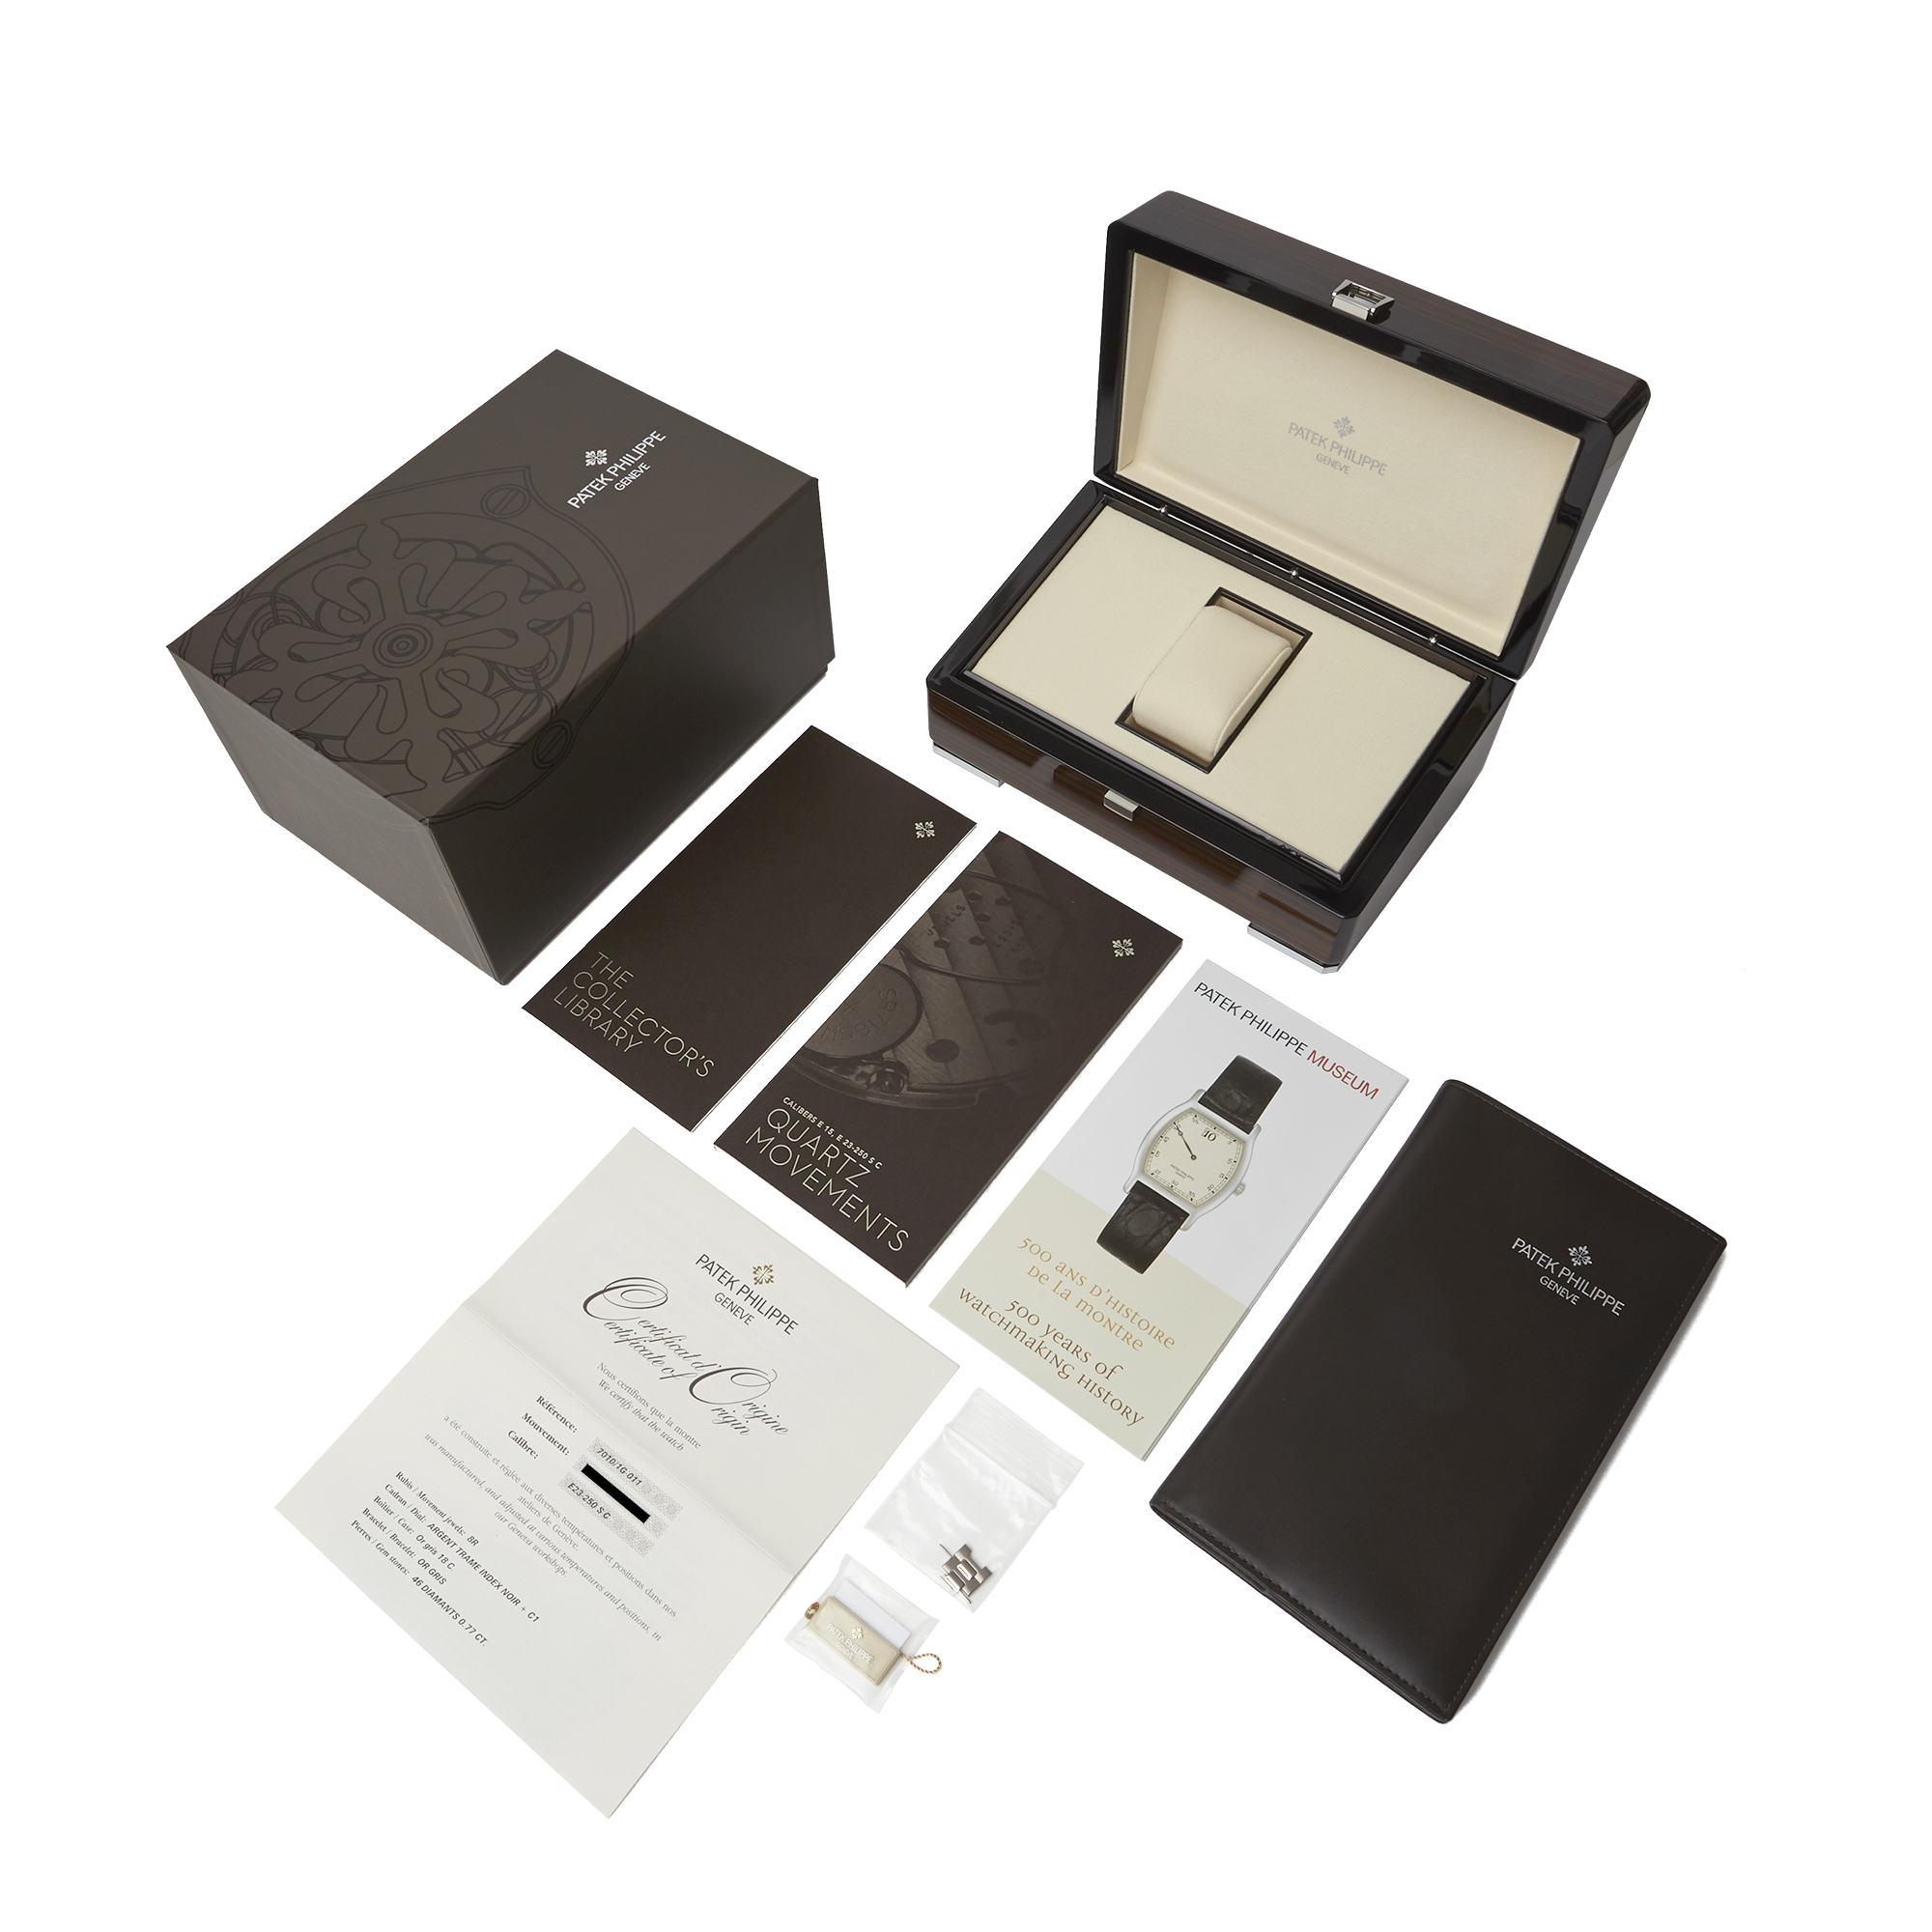 Patek Philippe Nautilus 7010G Ladies White Gold Diamond Watch - Image 3 of 8